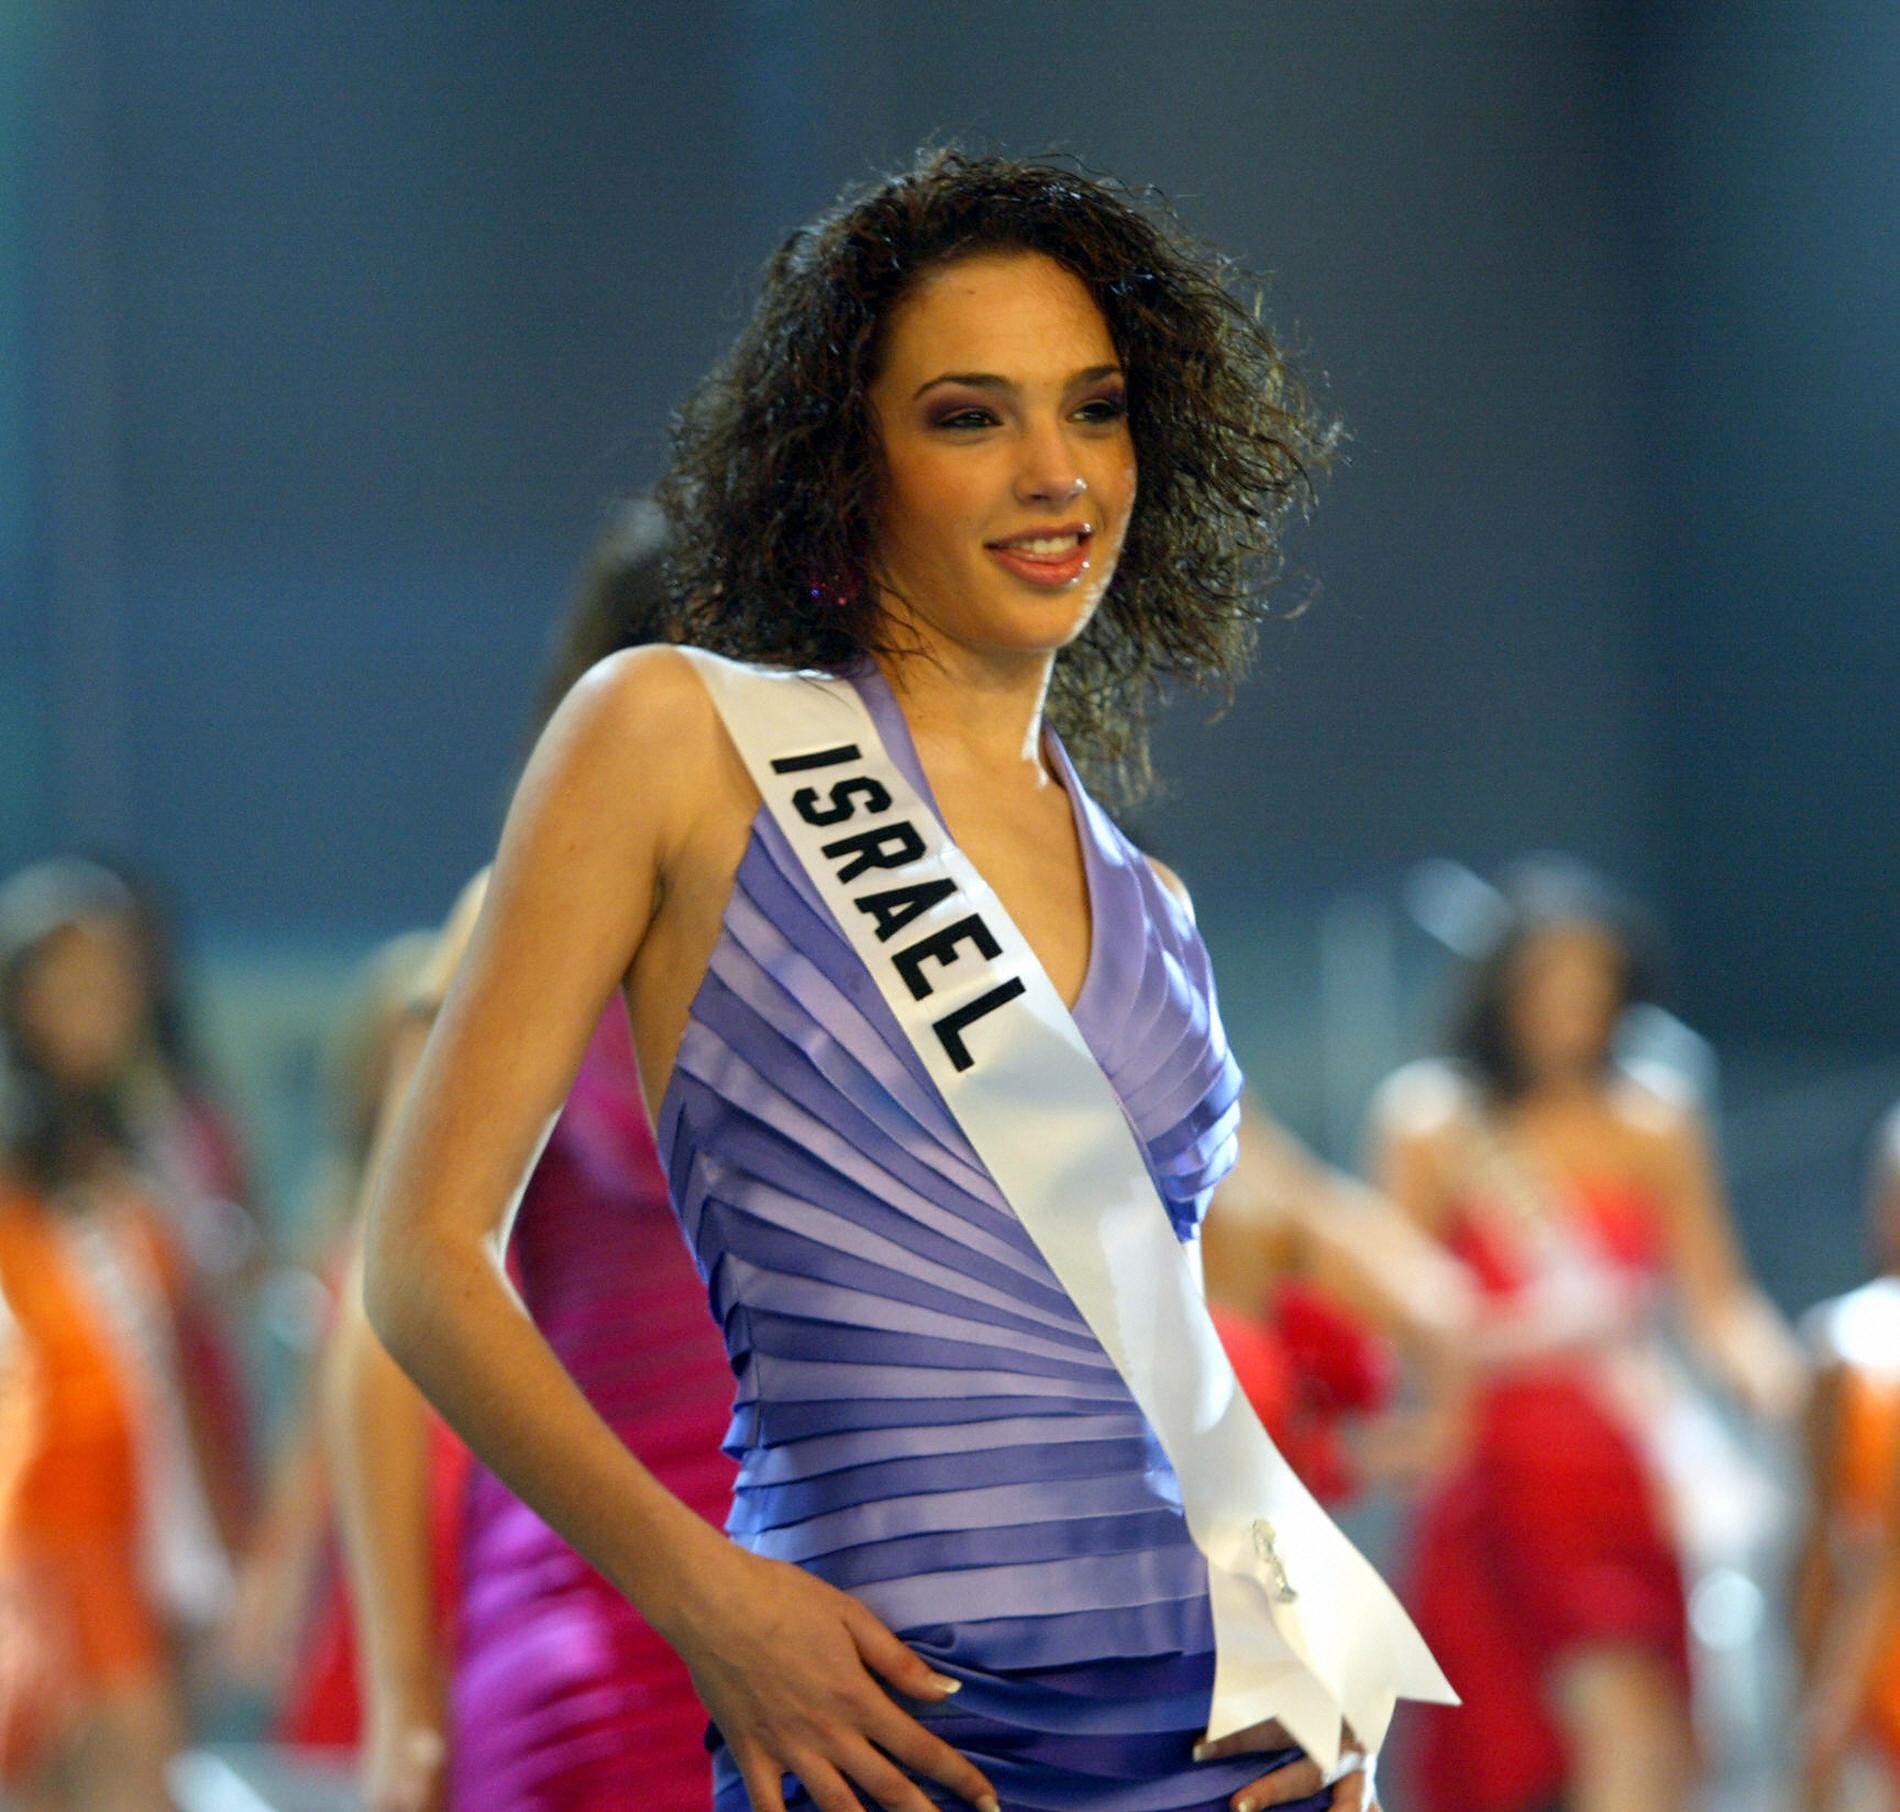 Gal Gadot In Miss Universe Pageant Photos Popsugar Celebrity Australia